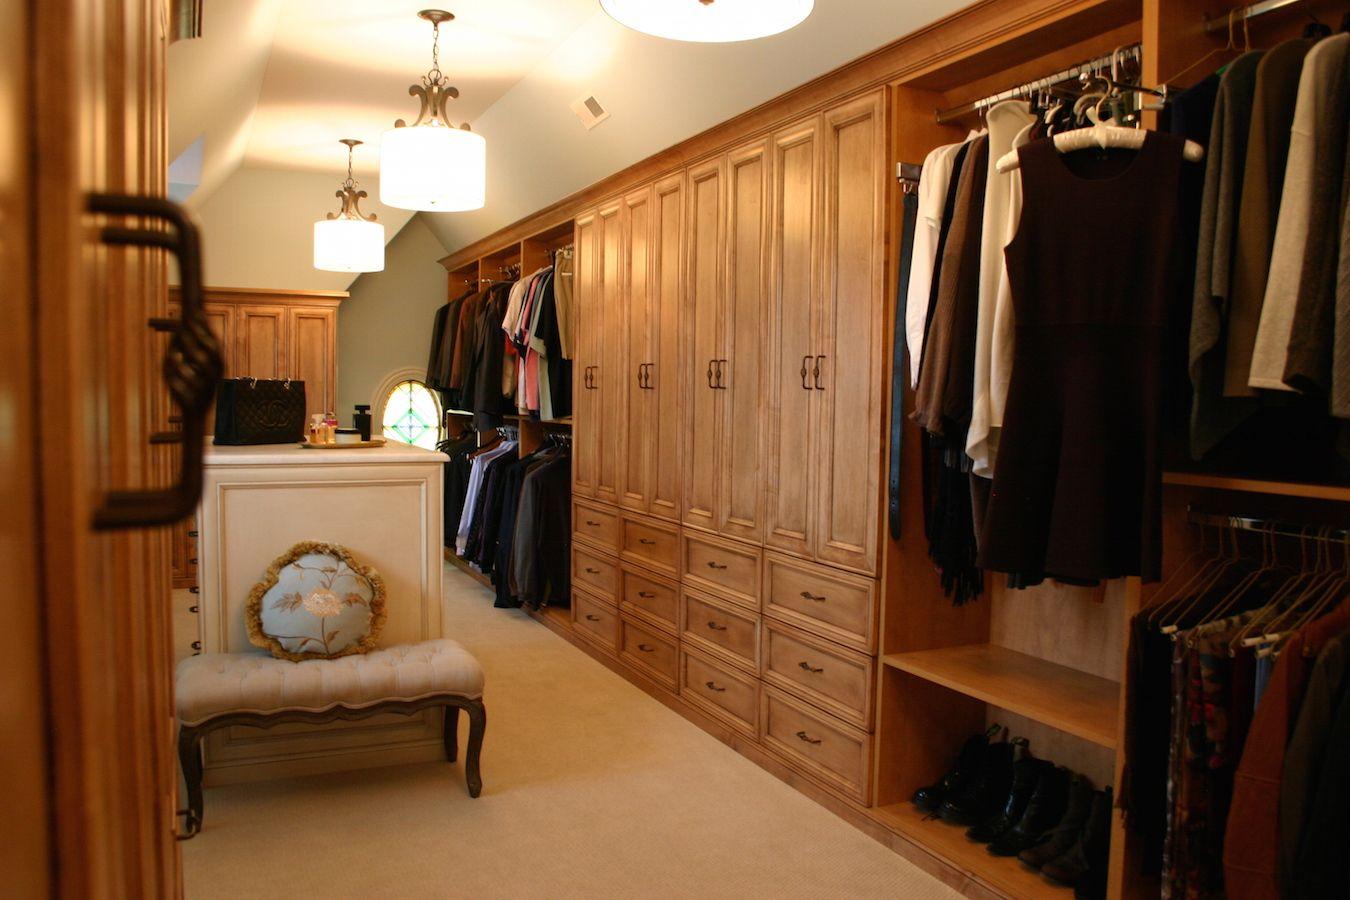 Exceptionnel Custom Closet Design Portfolio | Chicago Closets, Cabinets And Storage |  Crooked Oak